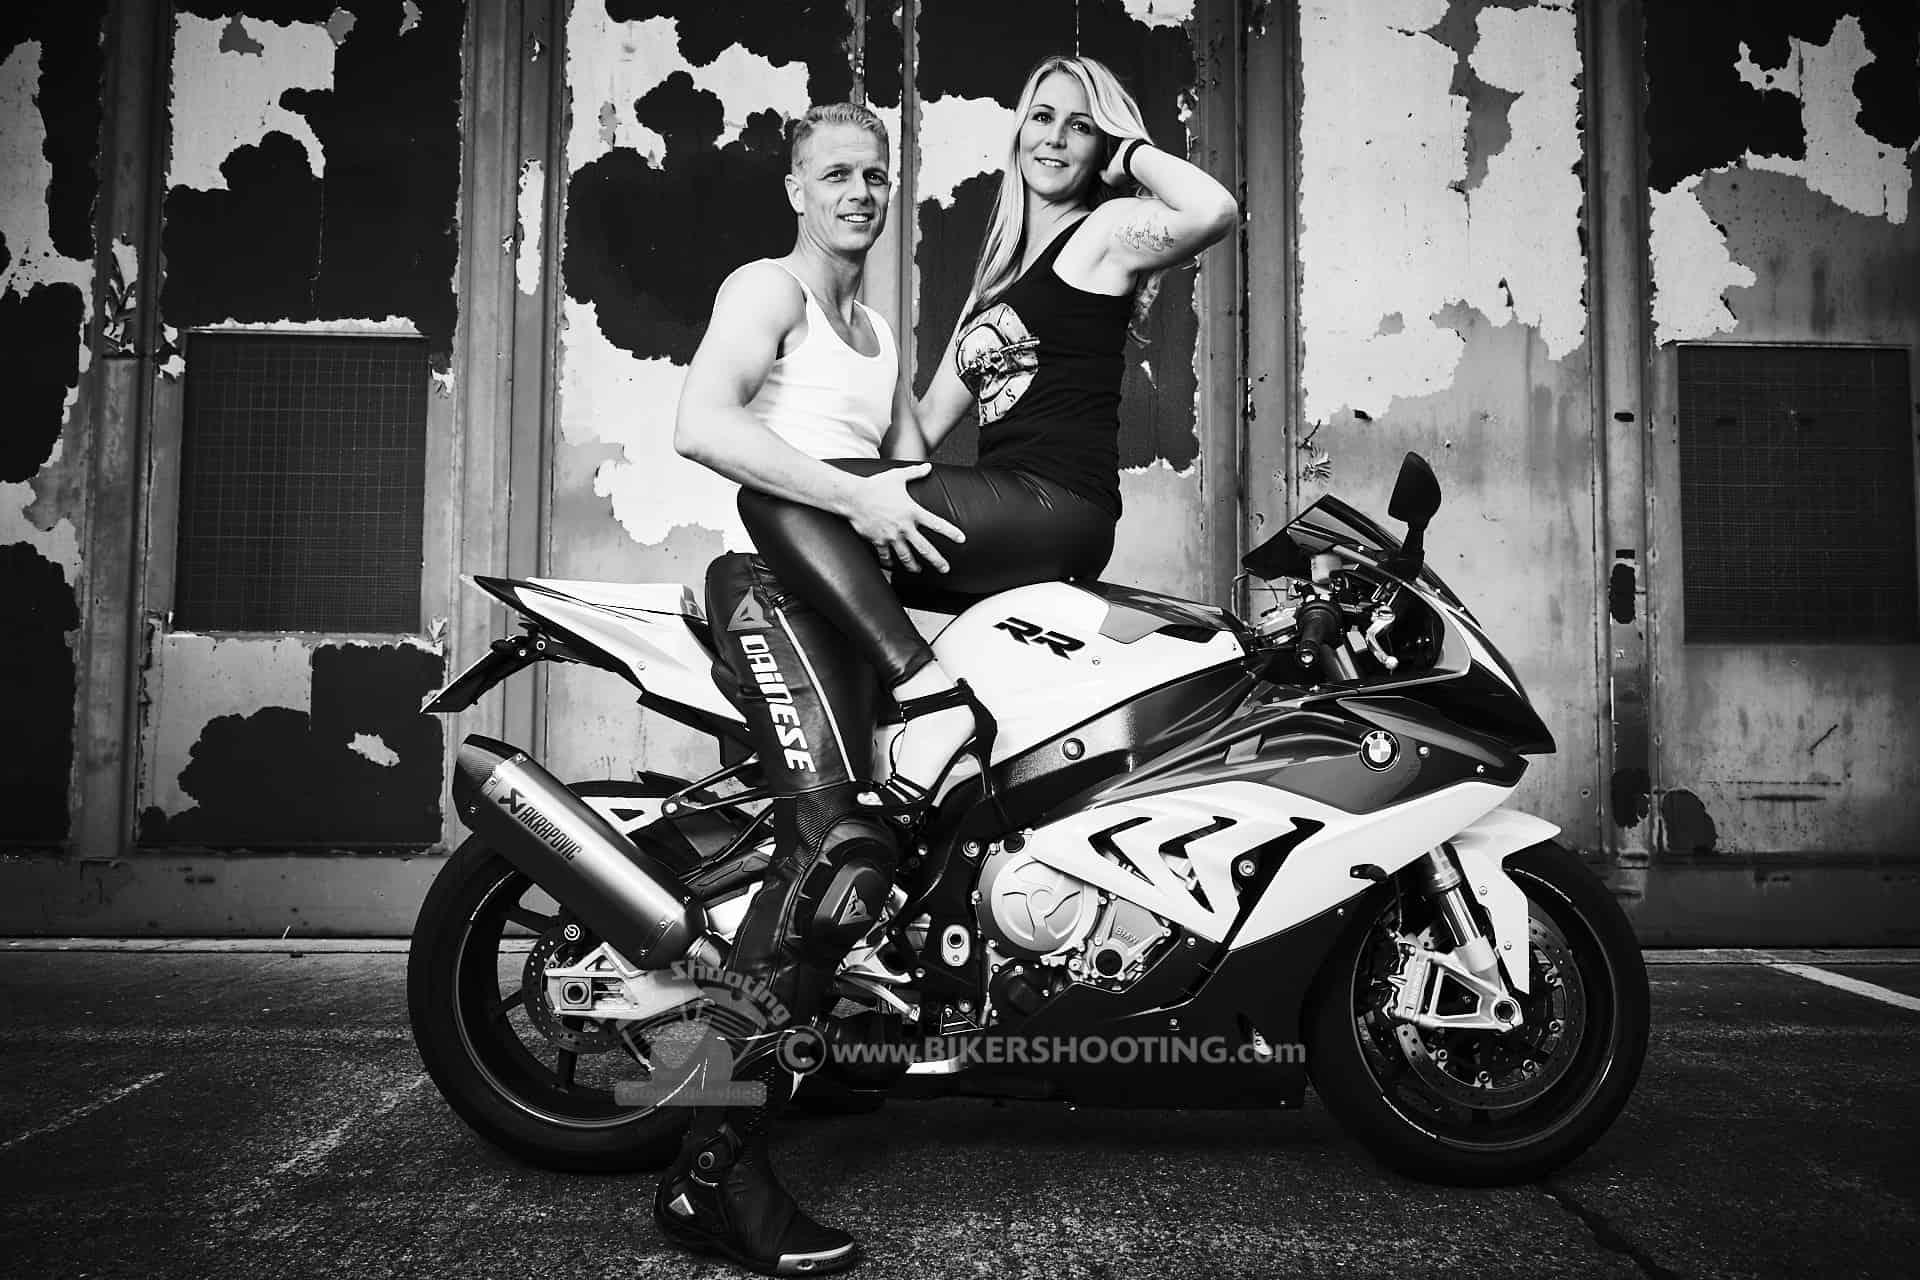 Biker Fotoshooting BUDDY Fotoshooting motorrad shooting, biker fotoshooting, fotoshooting mit motorrad, fotoshooting motorrad, motorrad fotoshooting